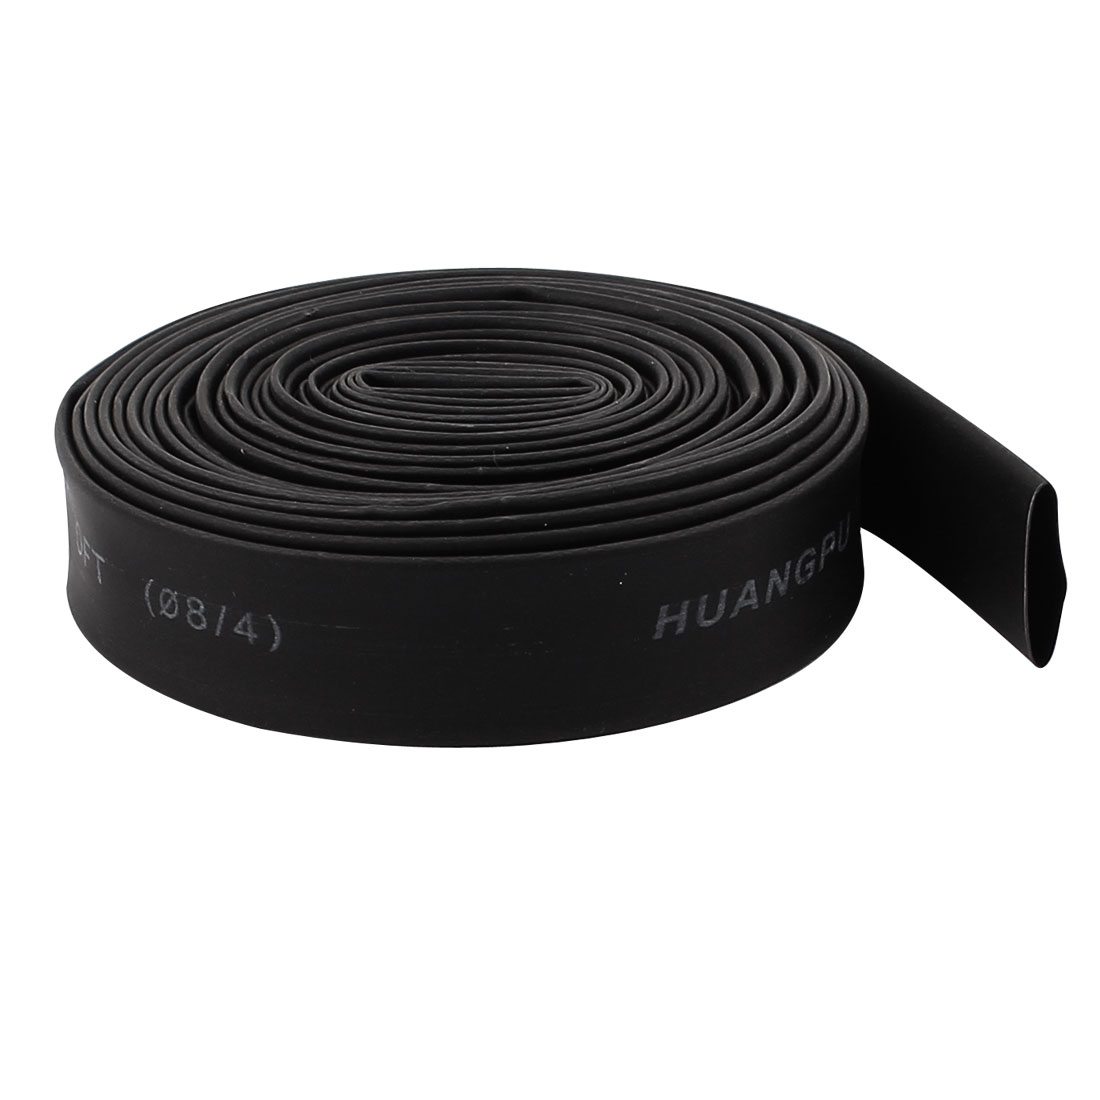 3 meter Length 8mm Dia Heat Shrink Tubing Tube Sleeving Wrap Wire